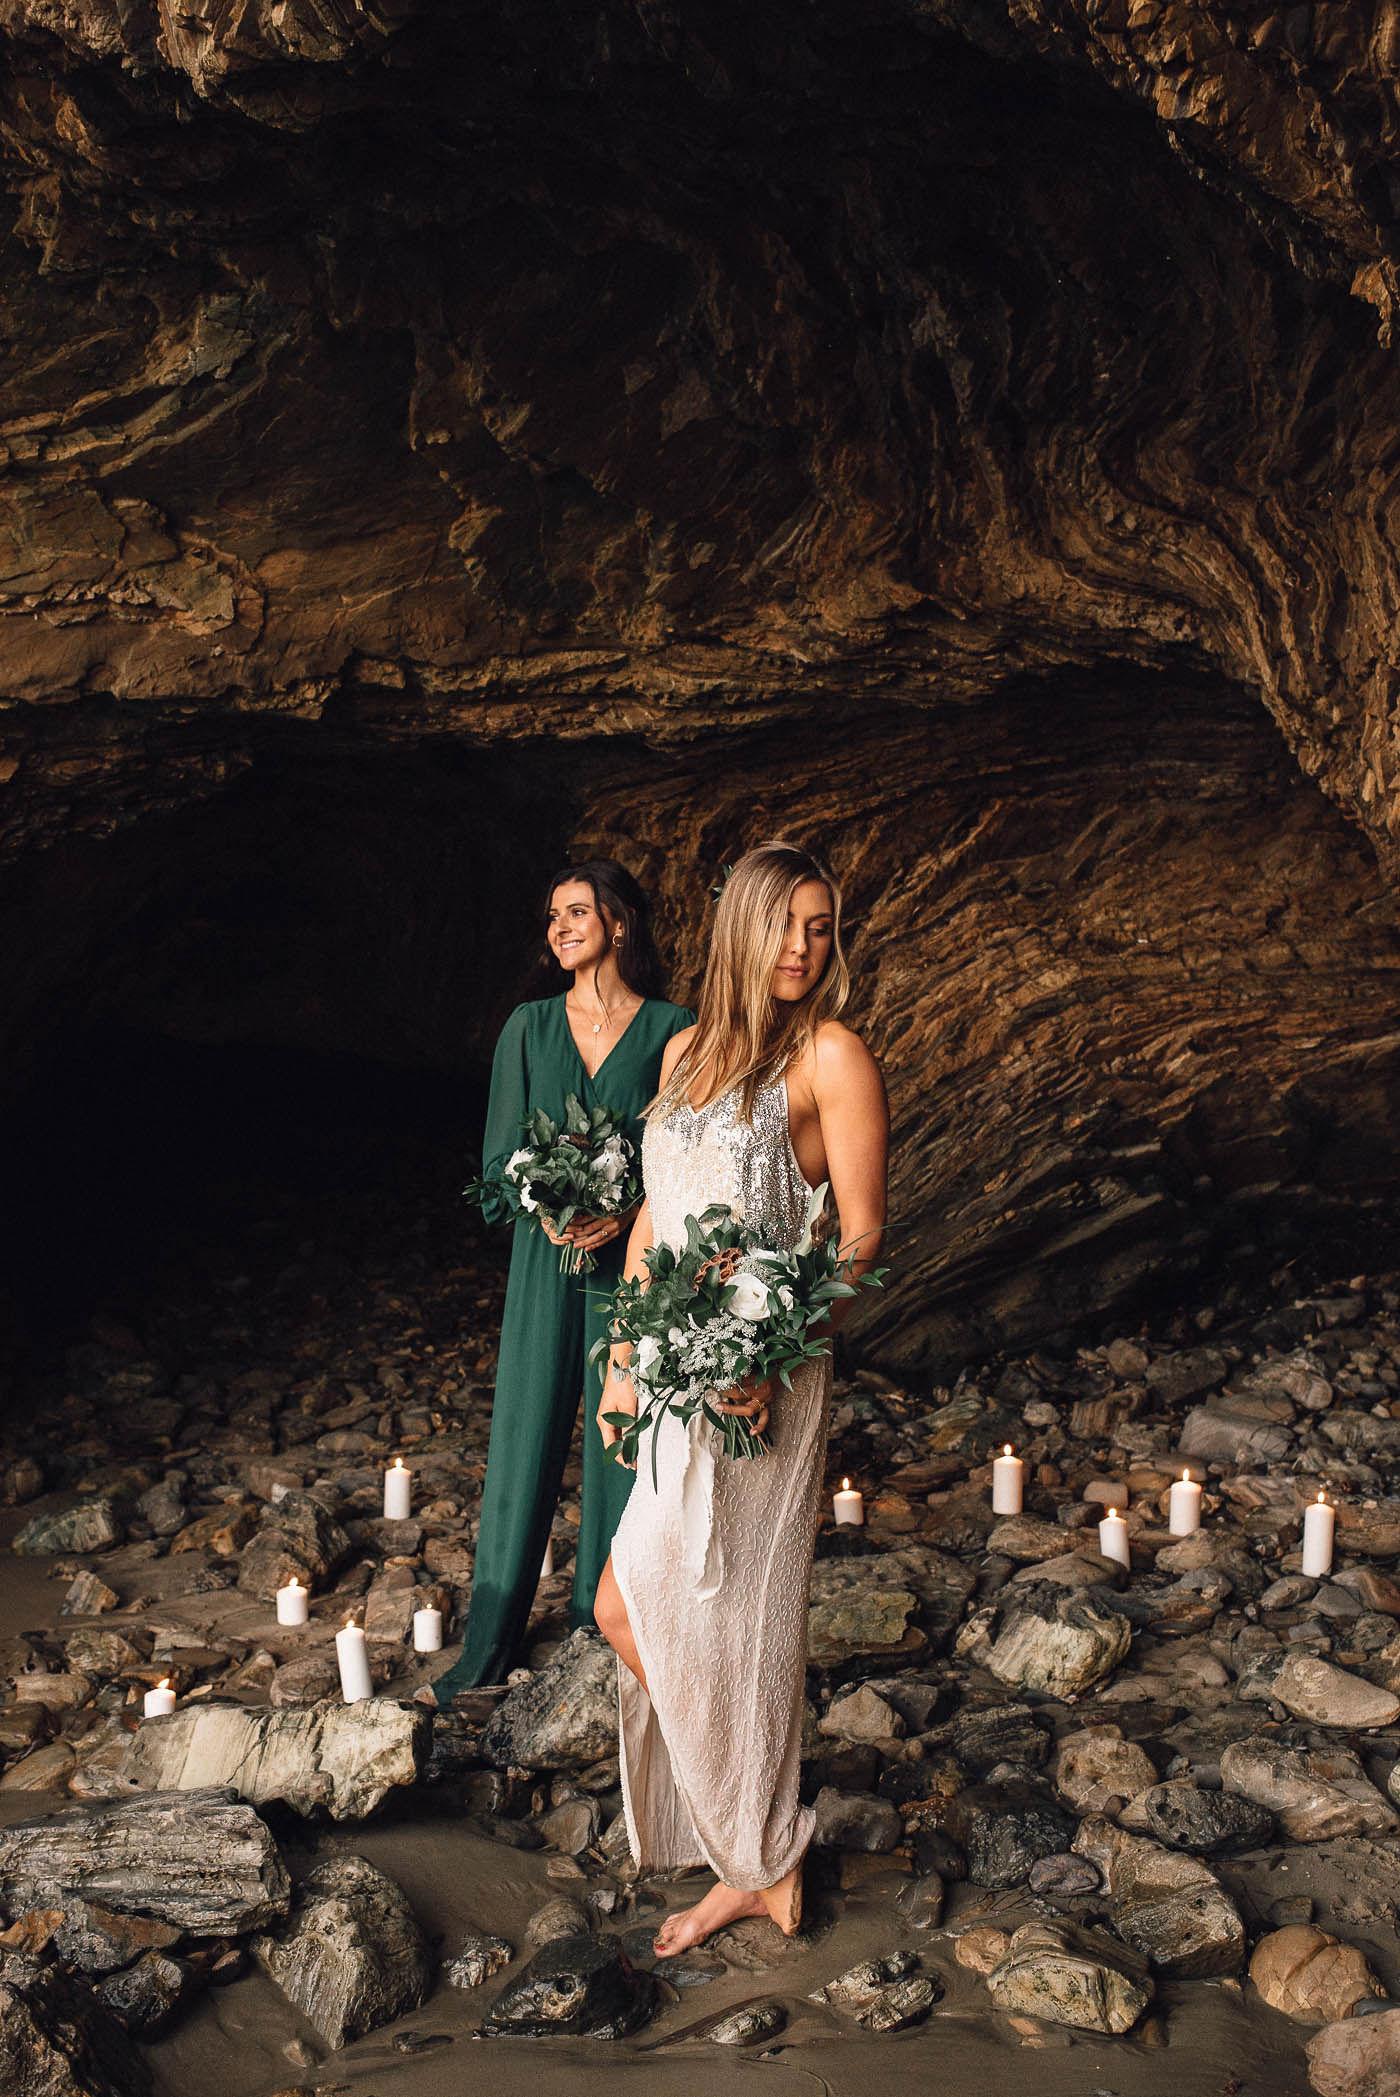 Romantic Same Sex Beach Elopement Inspiration in Earth Tones – Kalon Weddings Photography – Chloe Nicole Weddings 34